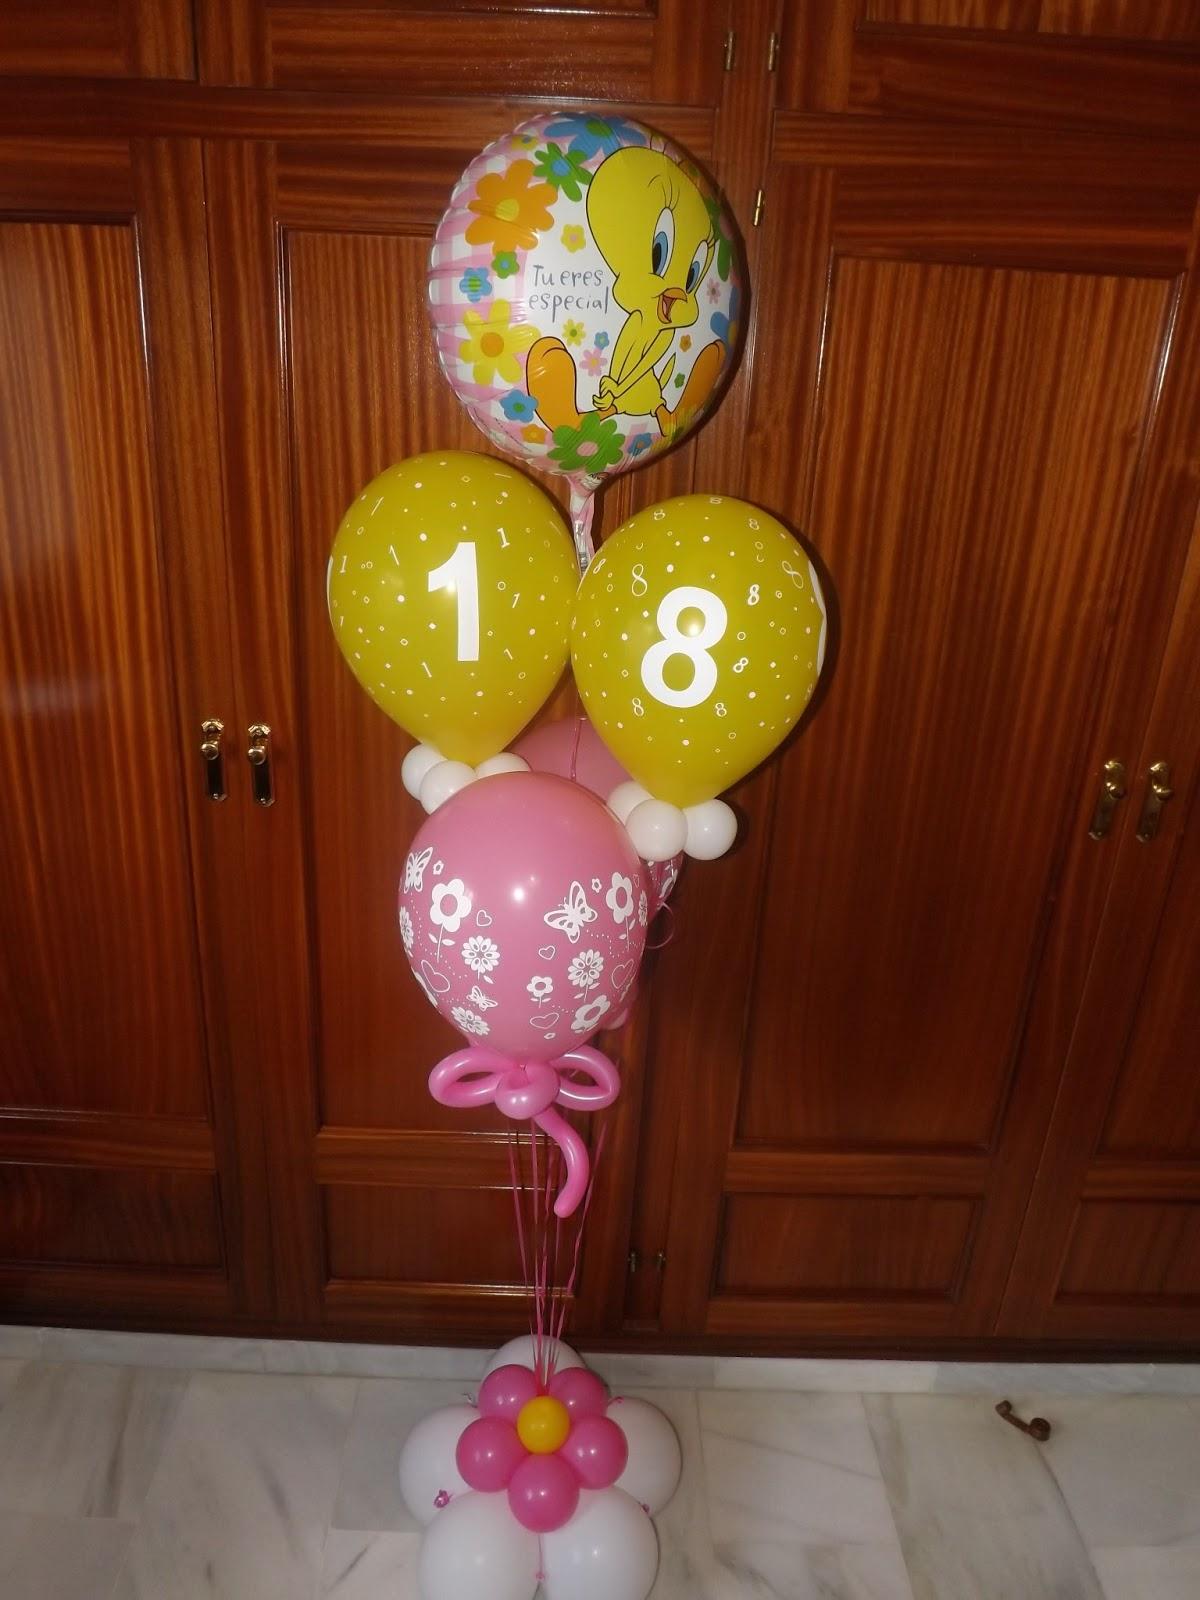 Decoraciones d 39 globos bouquets 18 30 48 cumplea os d - Decoracion 30 cumpleanos ...